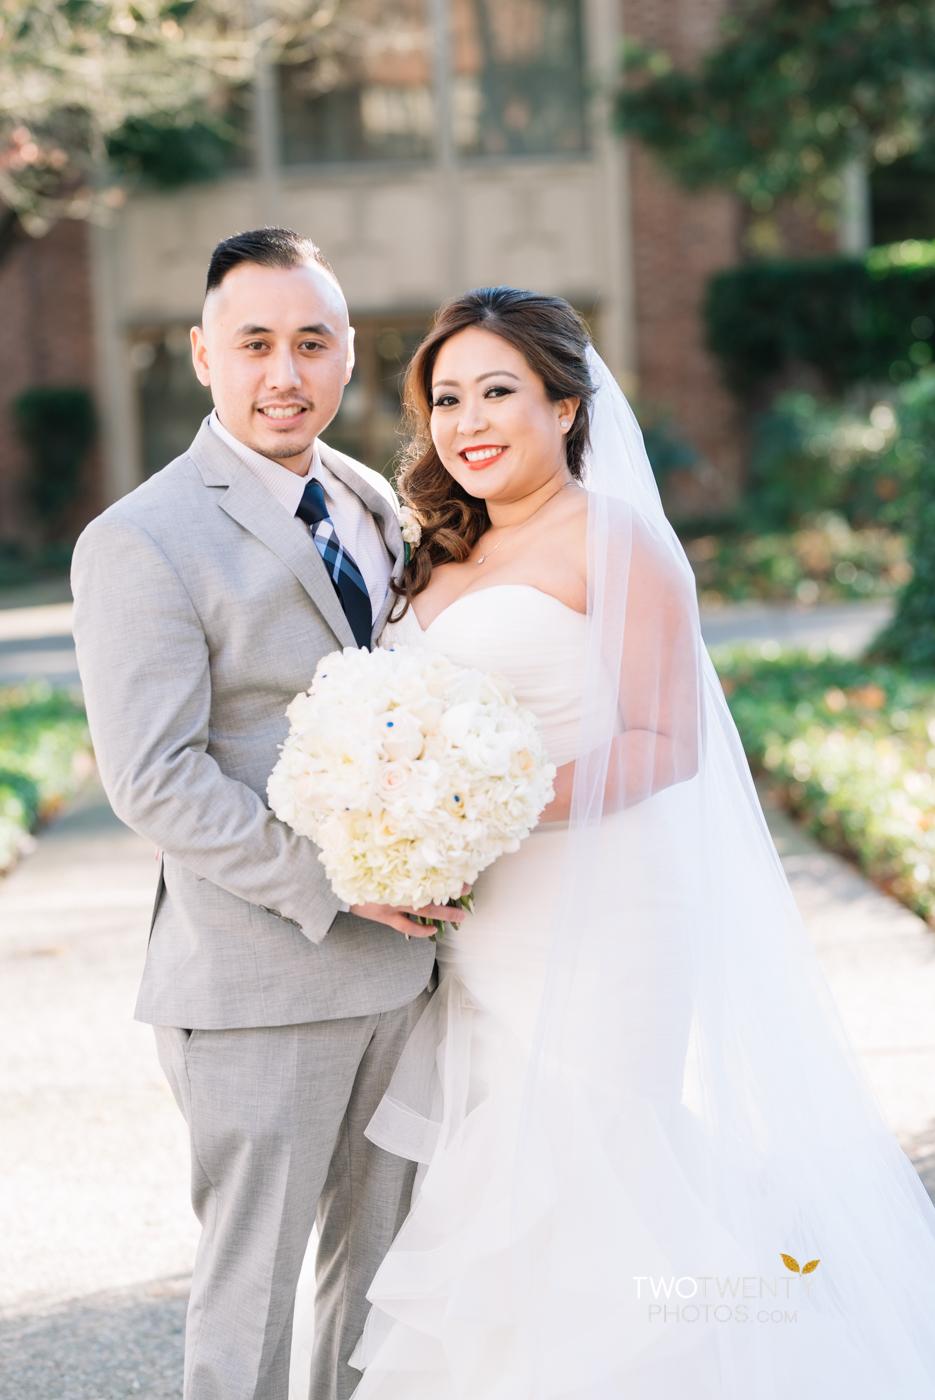 wedding-flowers-detail-acramento-wedding-photographer-8